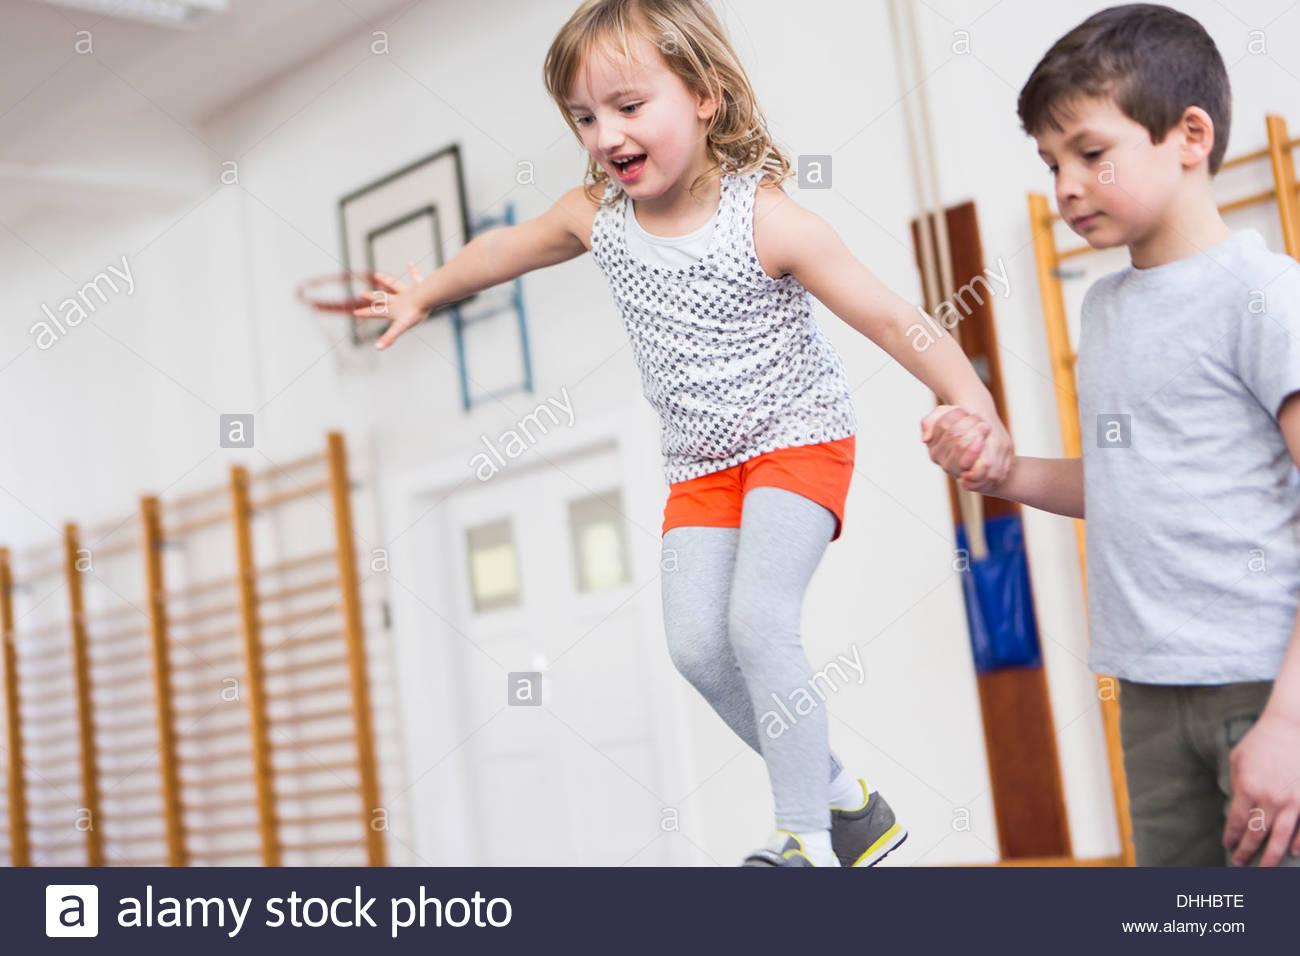 Boy holding girl's hand as she walks across balance beam - Stock Image